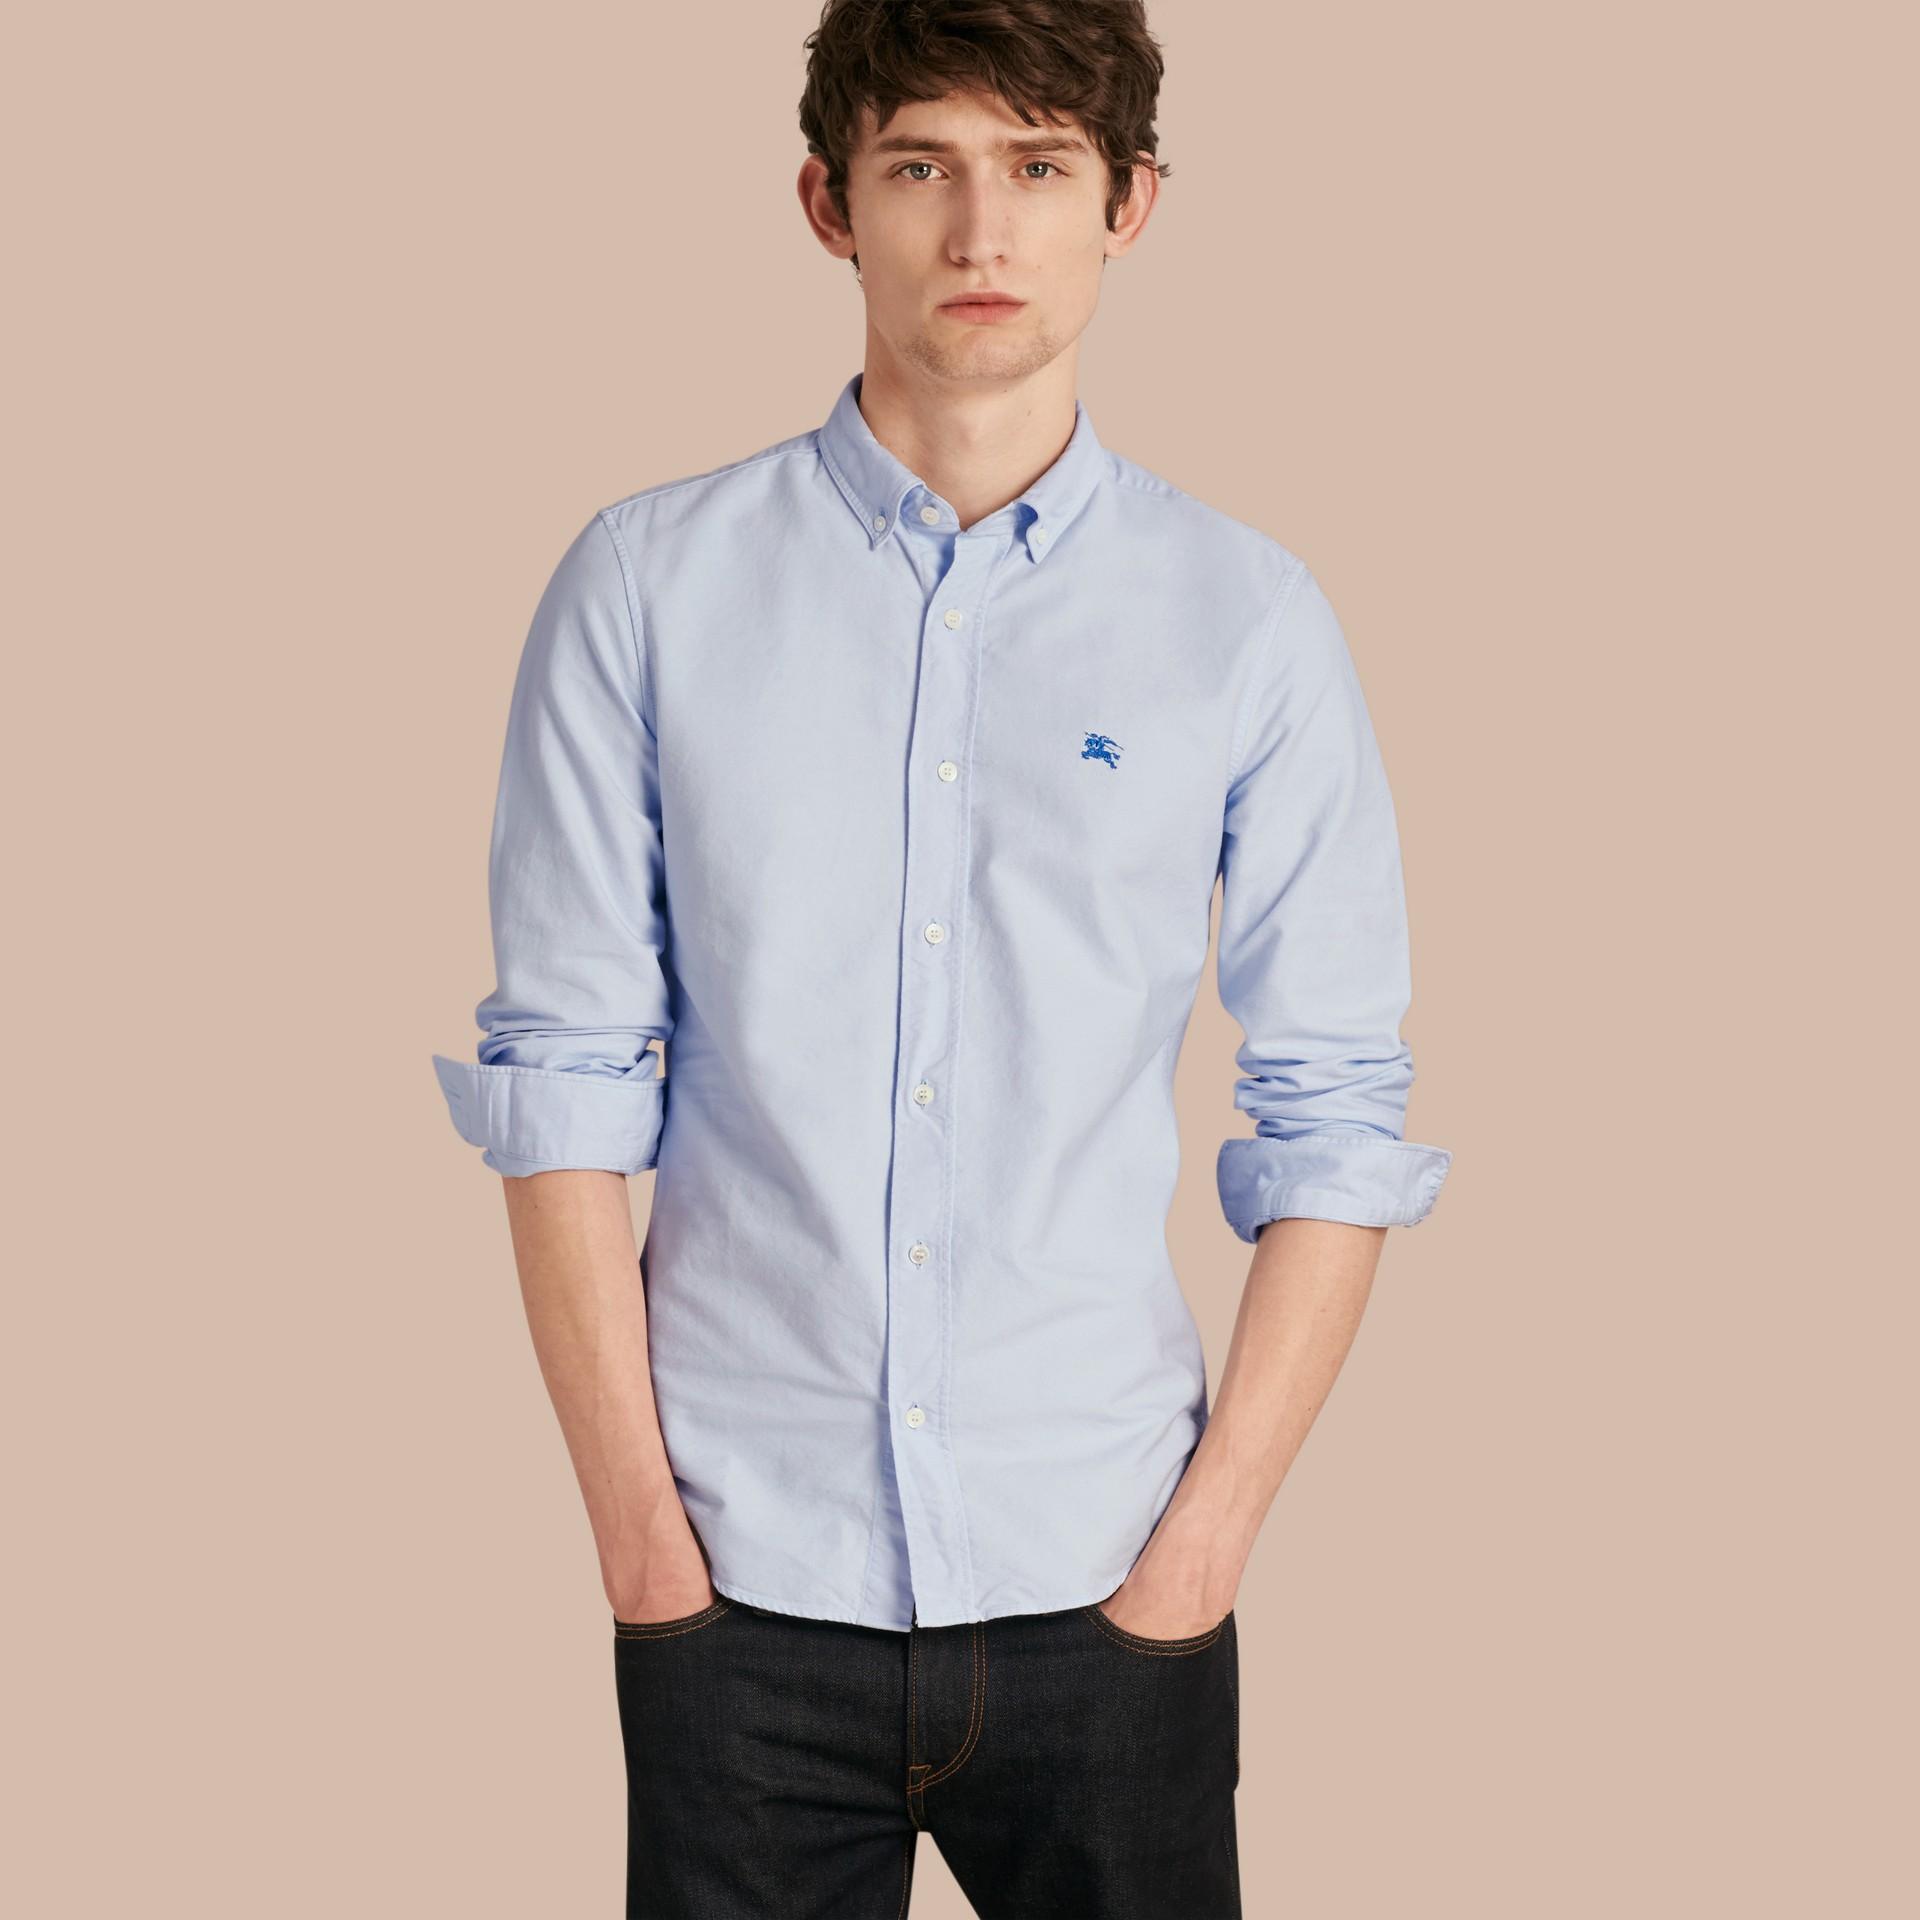 Hellblau Oxford-Hemd aus Baumwolle Hellblau - Galerie-Bild 1